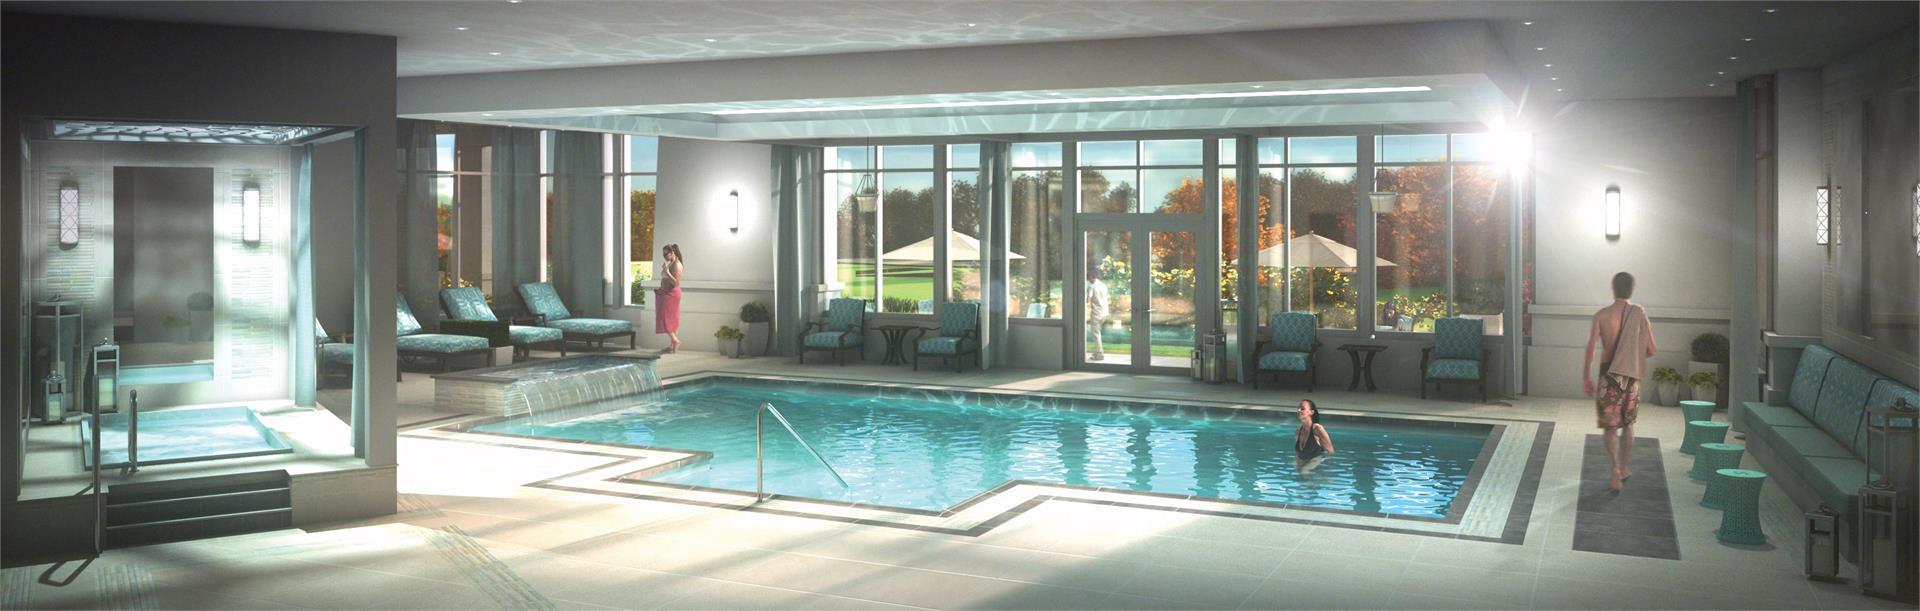 Rendering of Upper Vista Condos indoor swimming pool